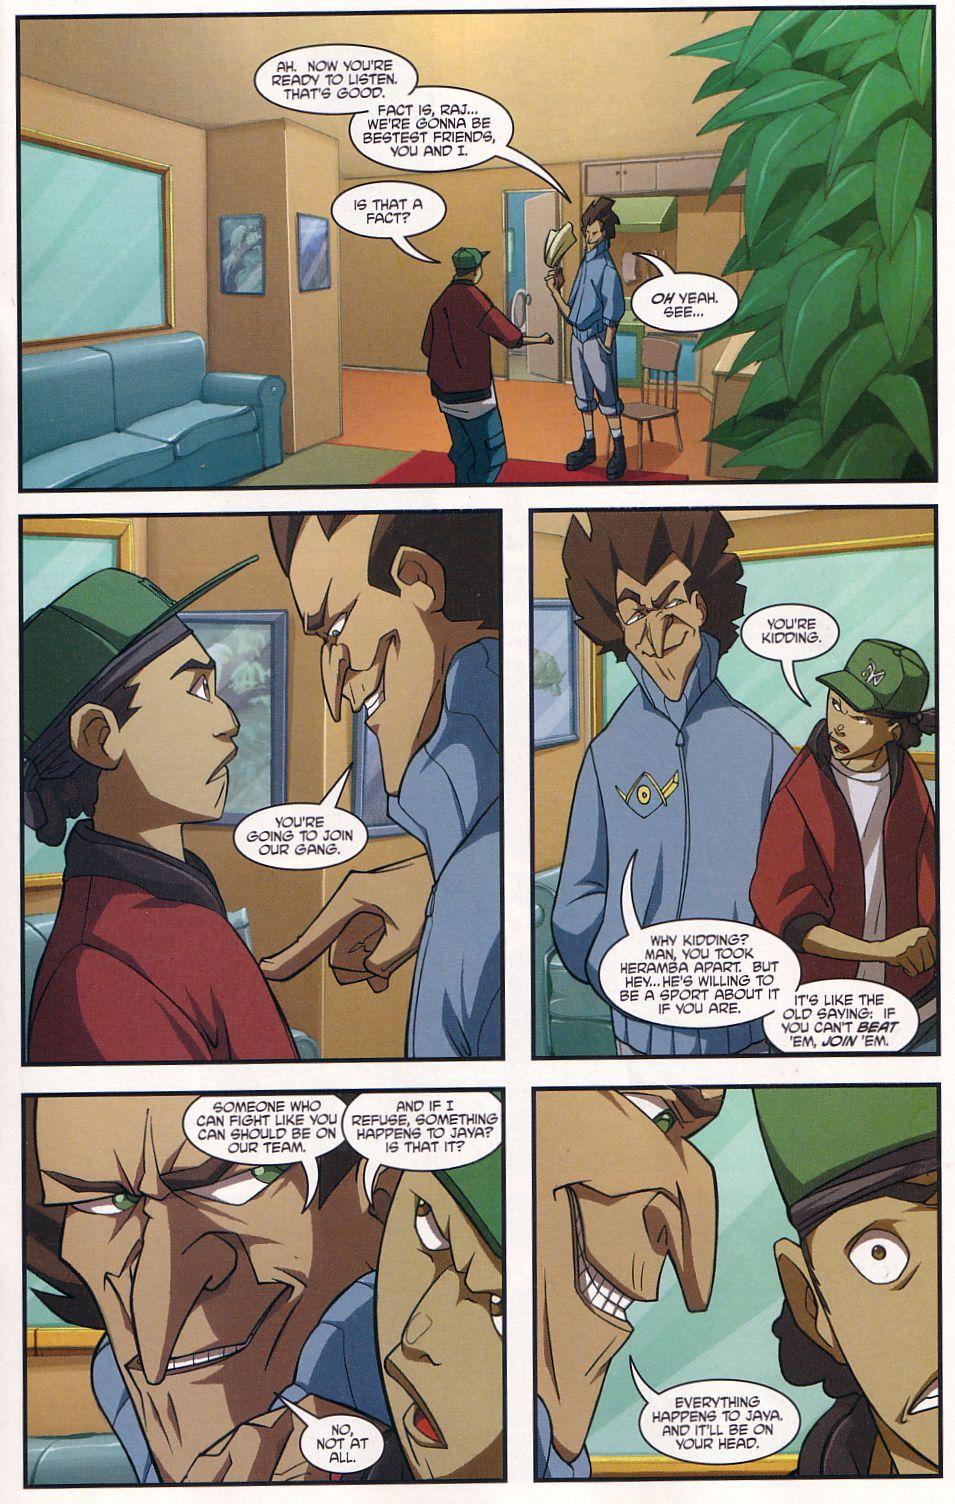 Teenage Mutant Ninja Turtles (2003) chap 7 pic 13